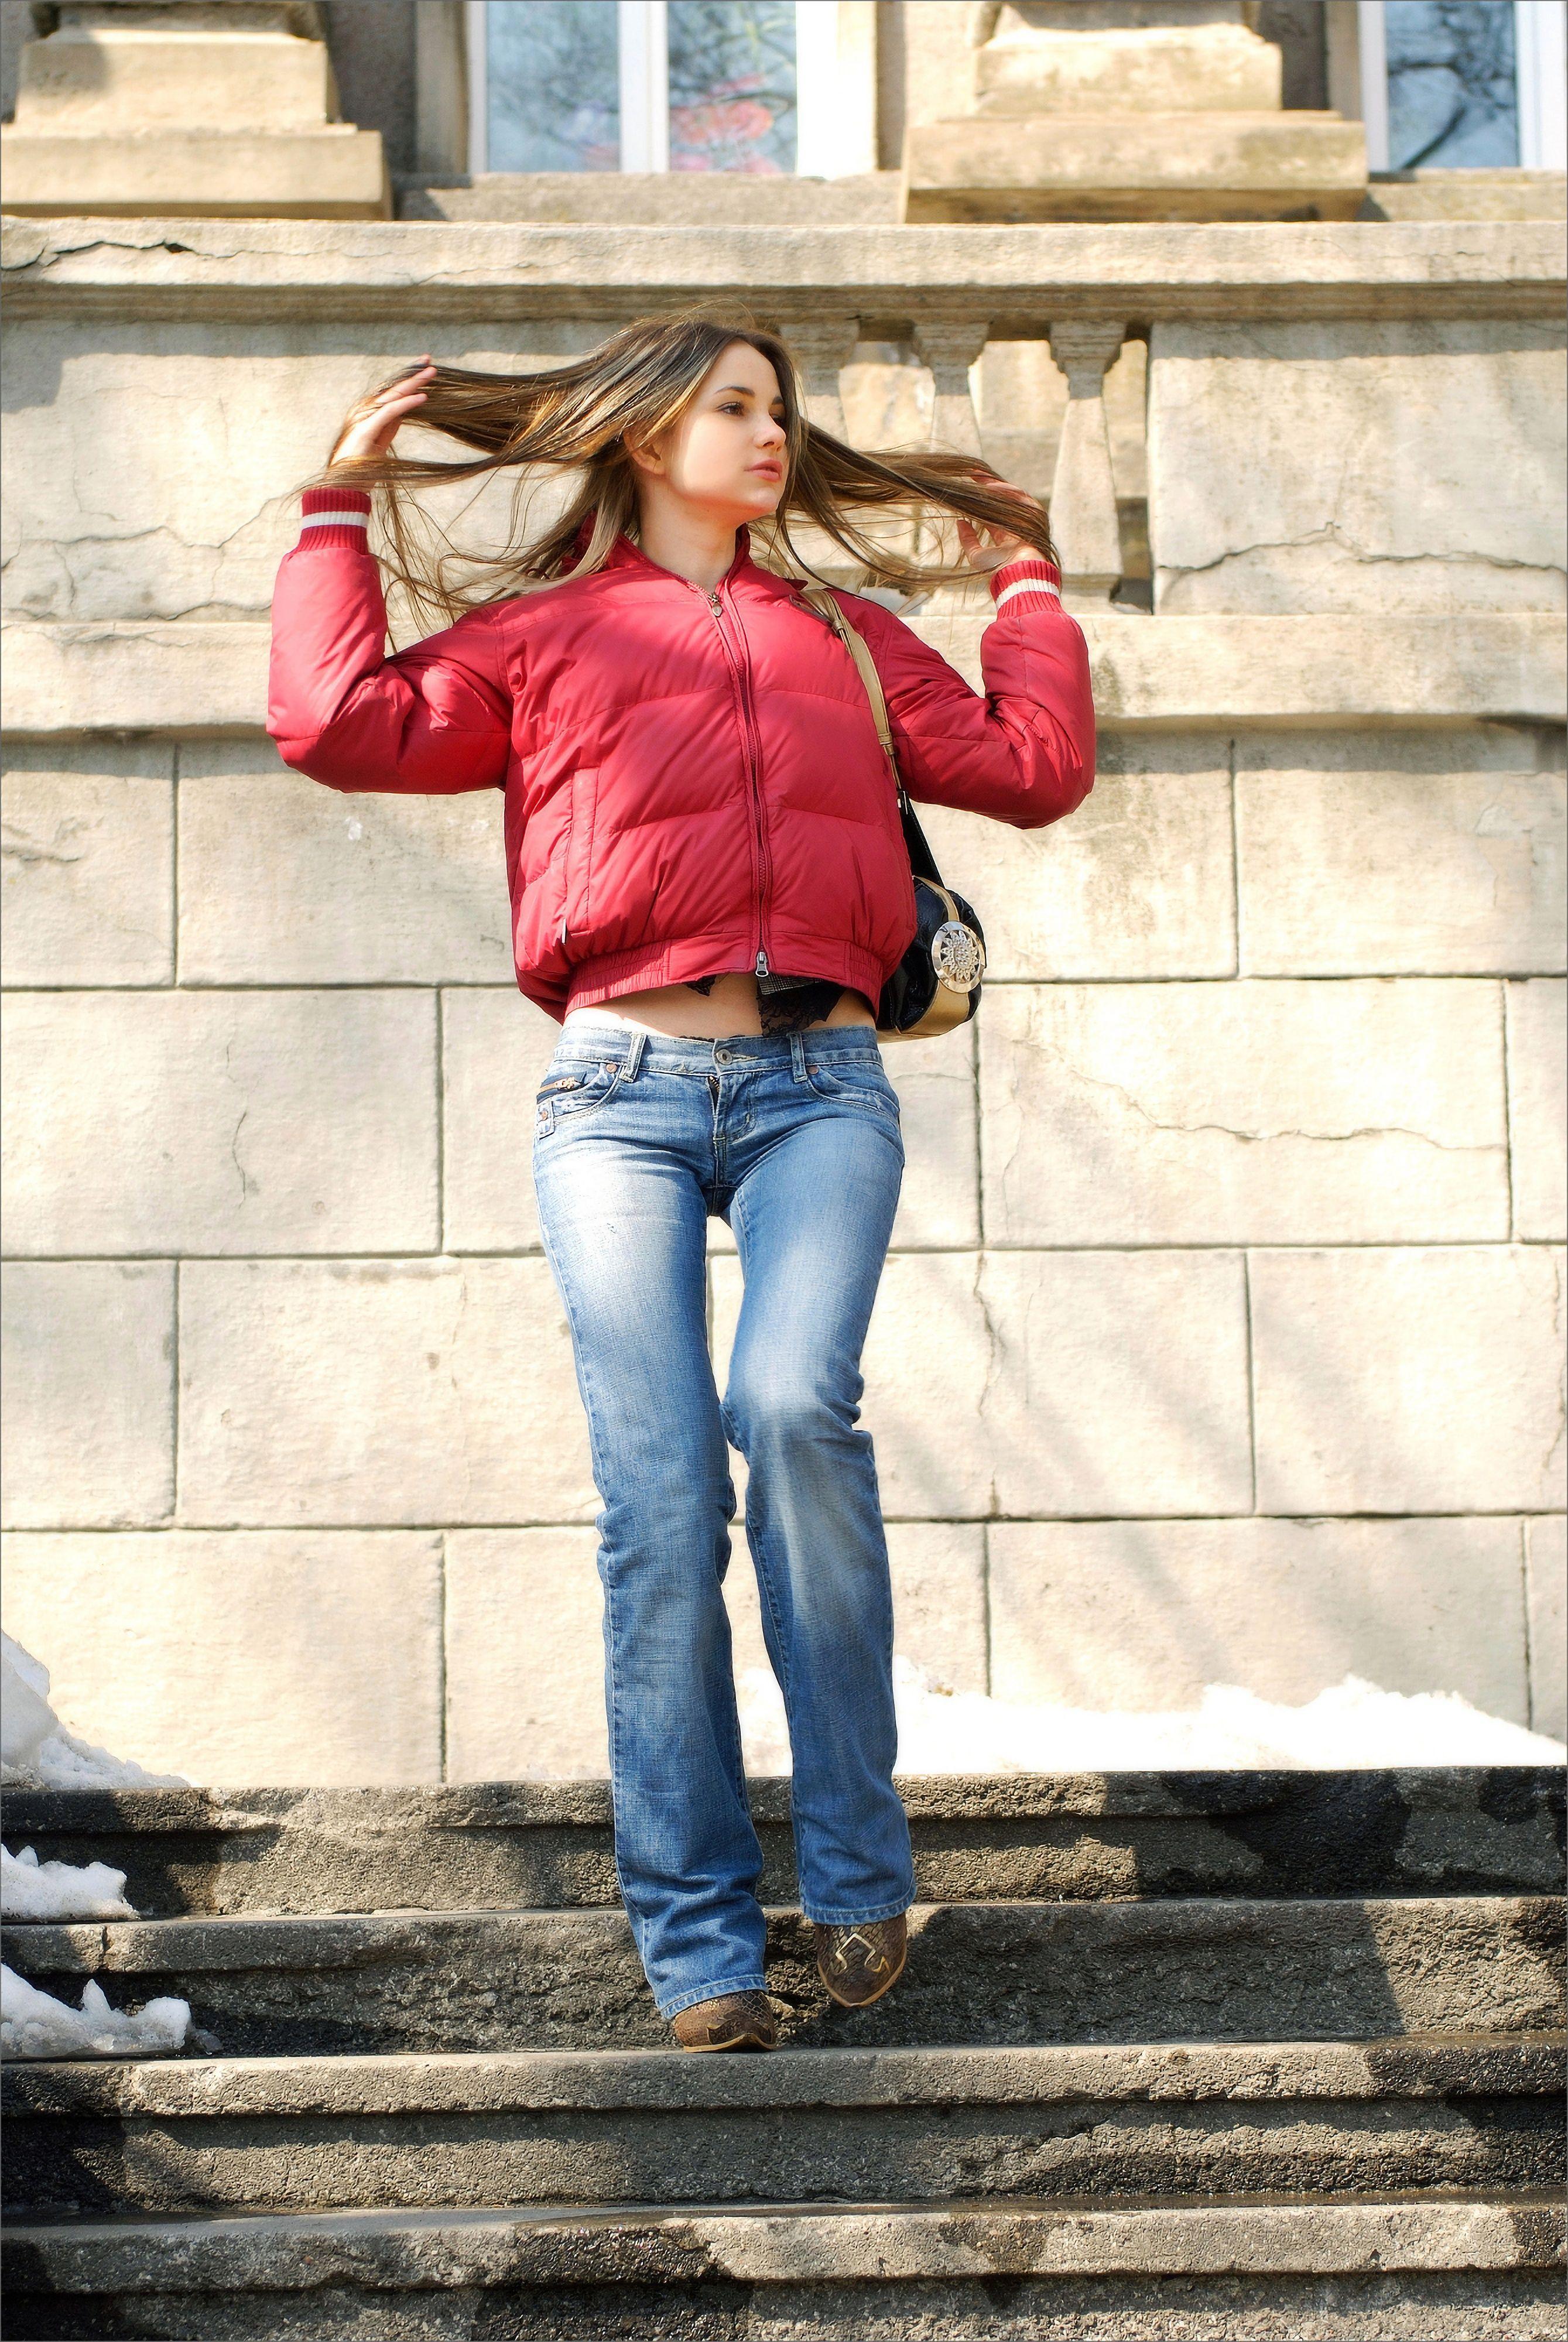 Irina Buromskih In 2020 Winter Jackets Jackets Fashion